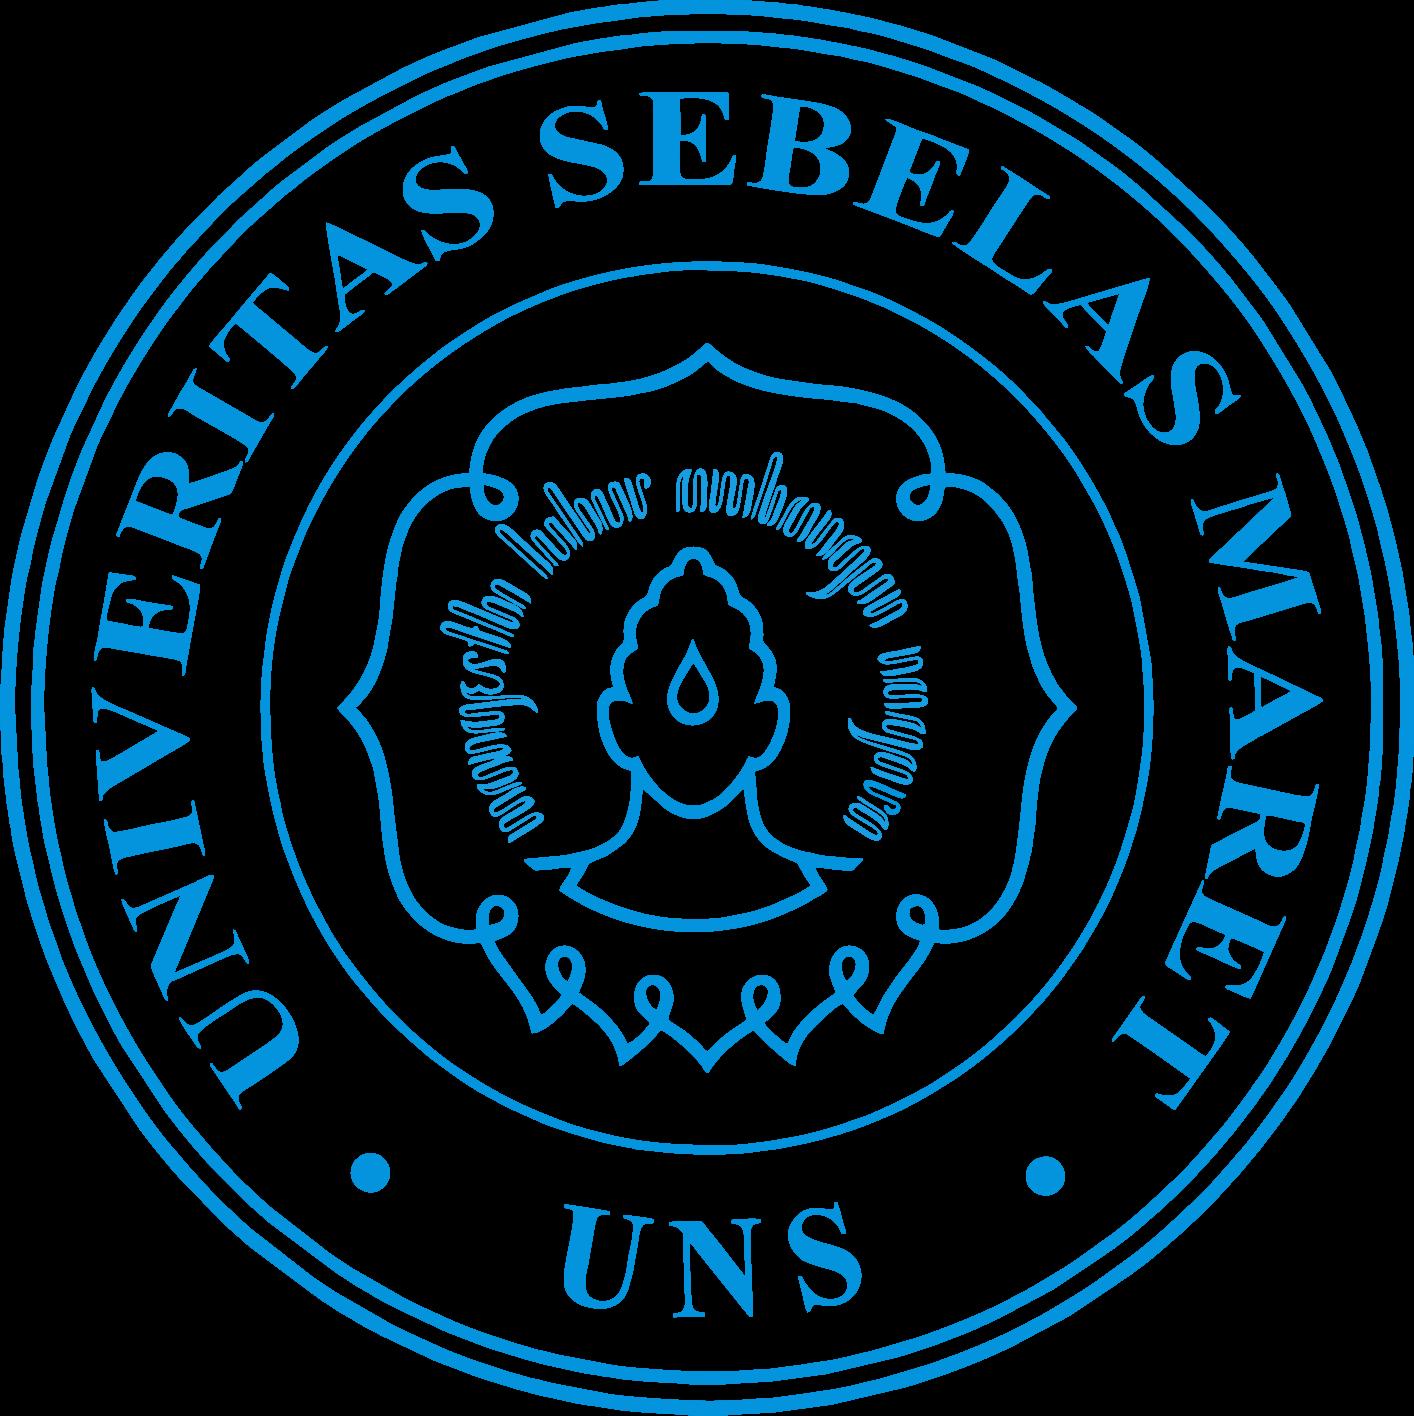 Download Logo Uns Universitas Sebelas Maret Format Cdr Eps Png Jpg Hd Logodud Format Cdr Png Ai Eps